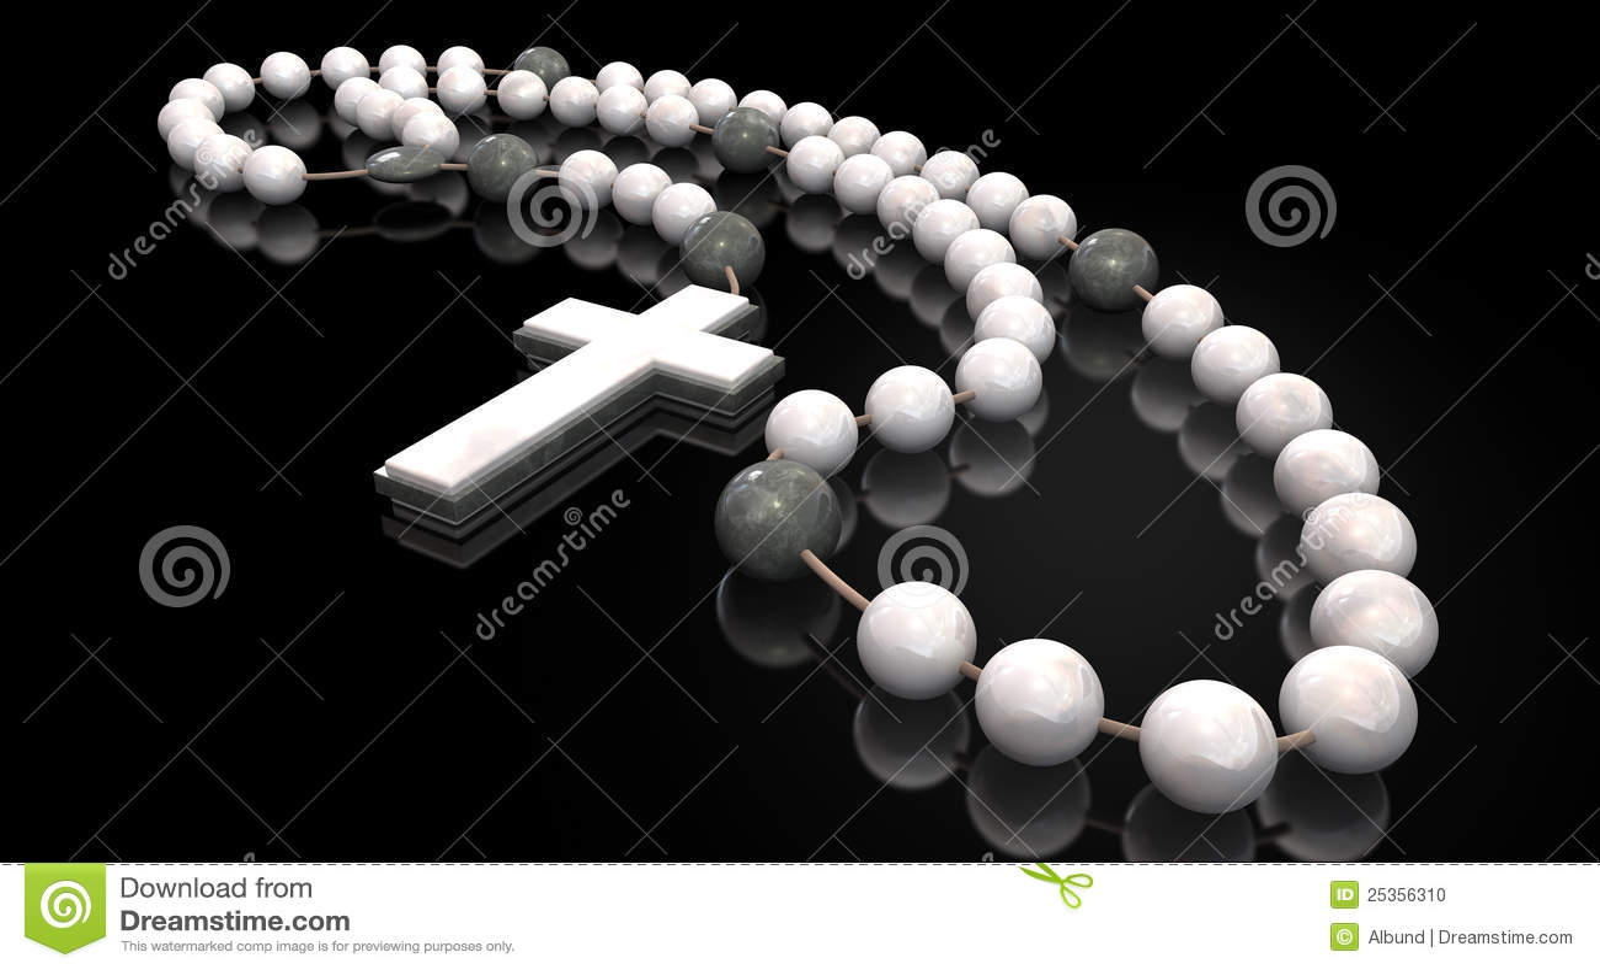 Stone Rosary Beads Stock Photo Image 25356310